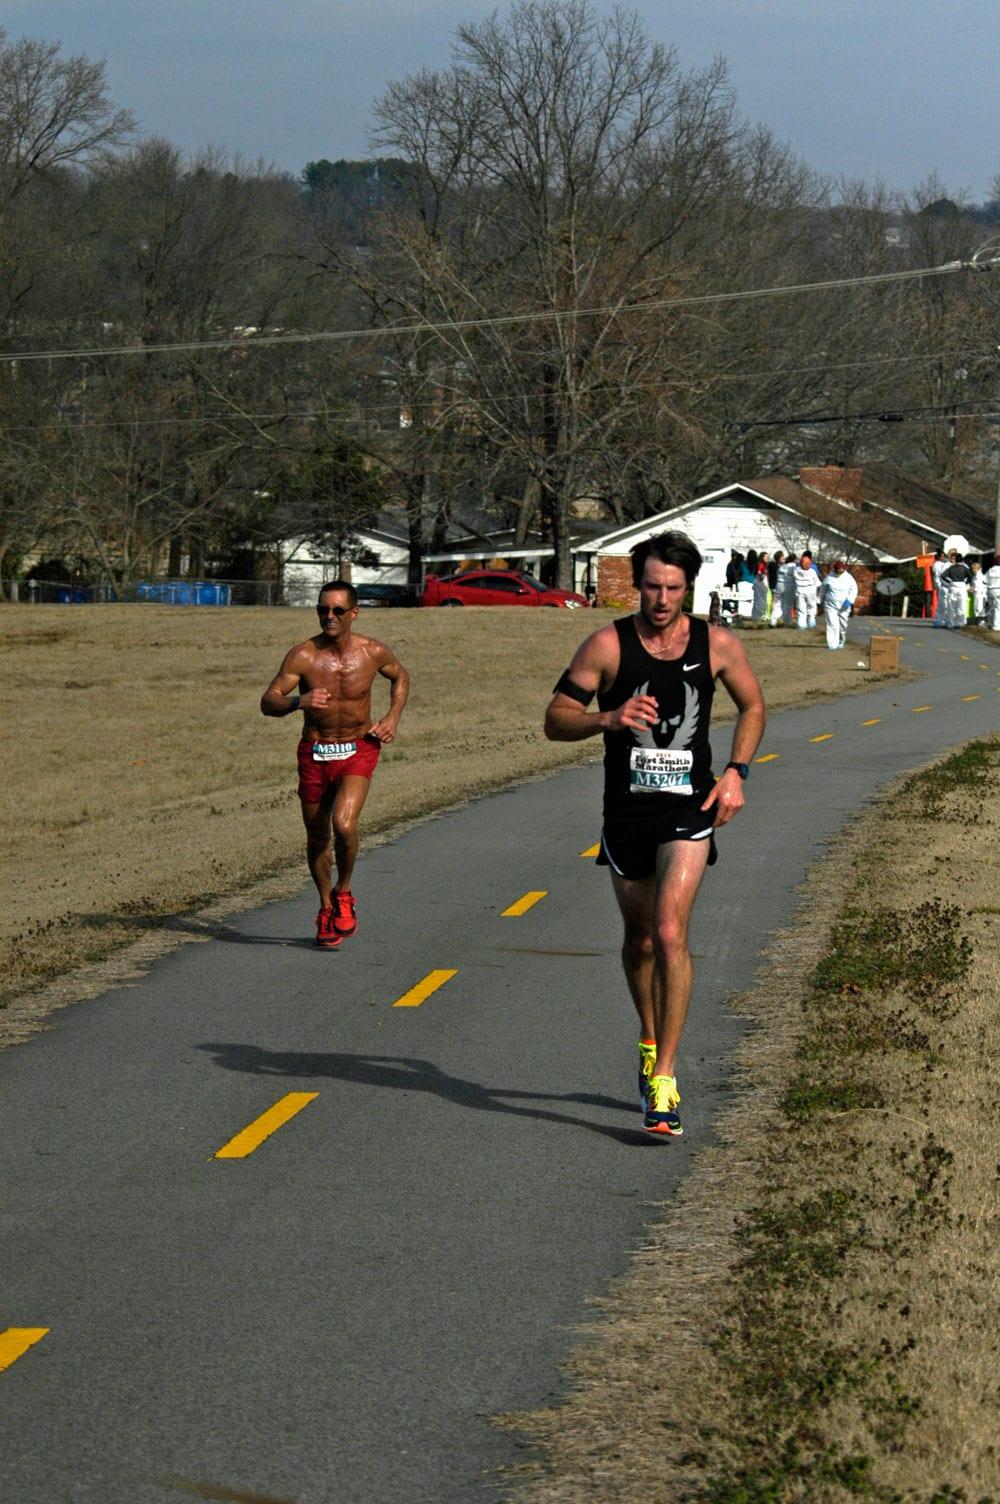 Randy Johnson, left, trails Cody Skarupa at Mile 13 of the Fort Smith Marathon.